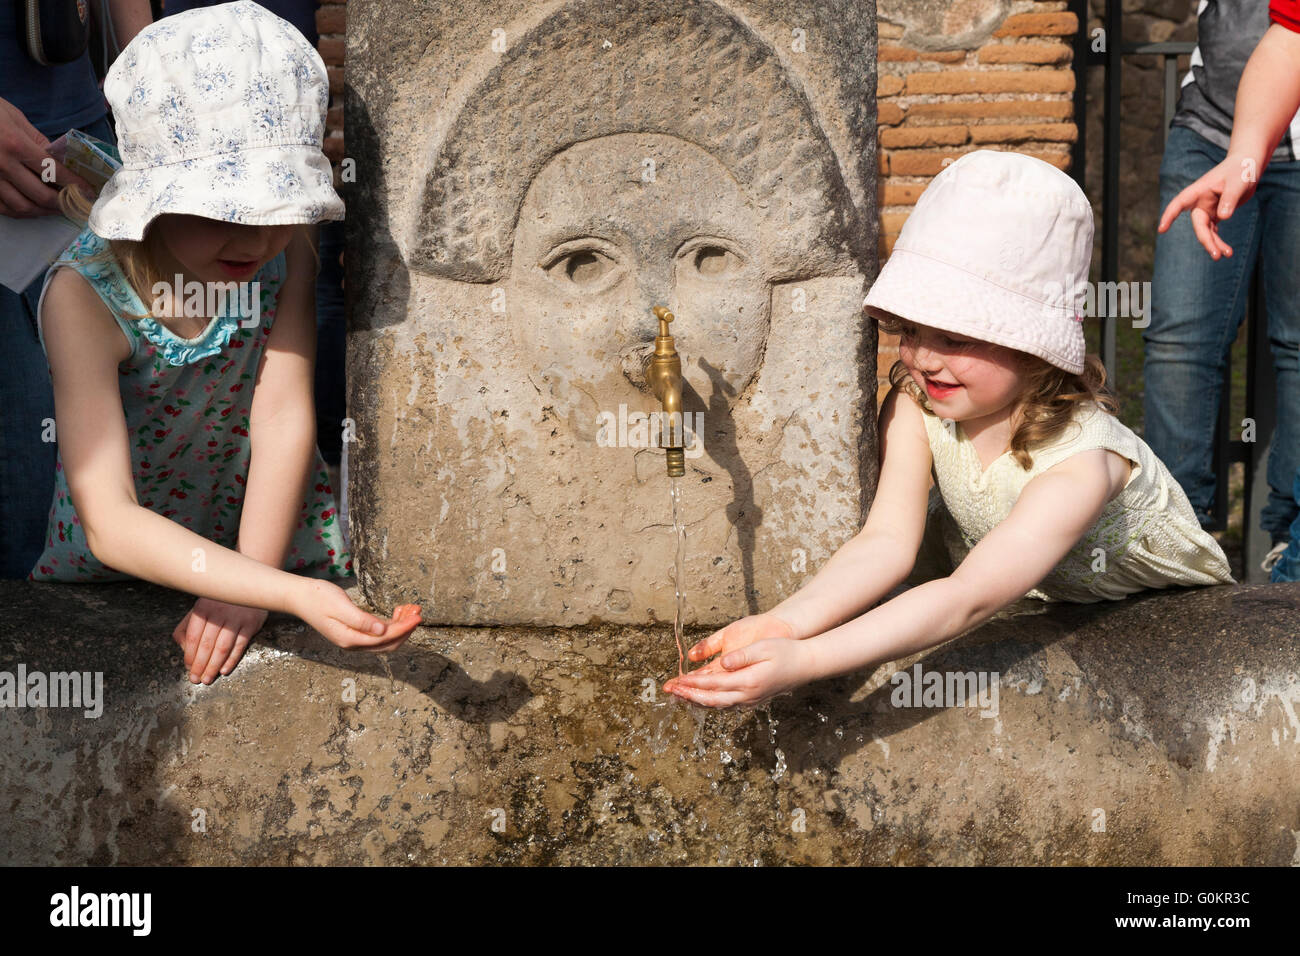 Tourist tourists child children kid kids drink / drinking from a public water fountain tap in Roman Pompeii Pompei. - Stock Image